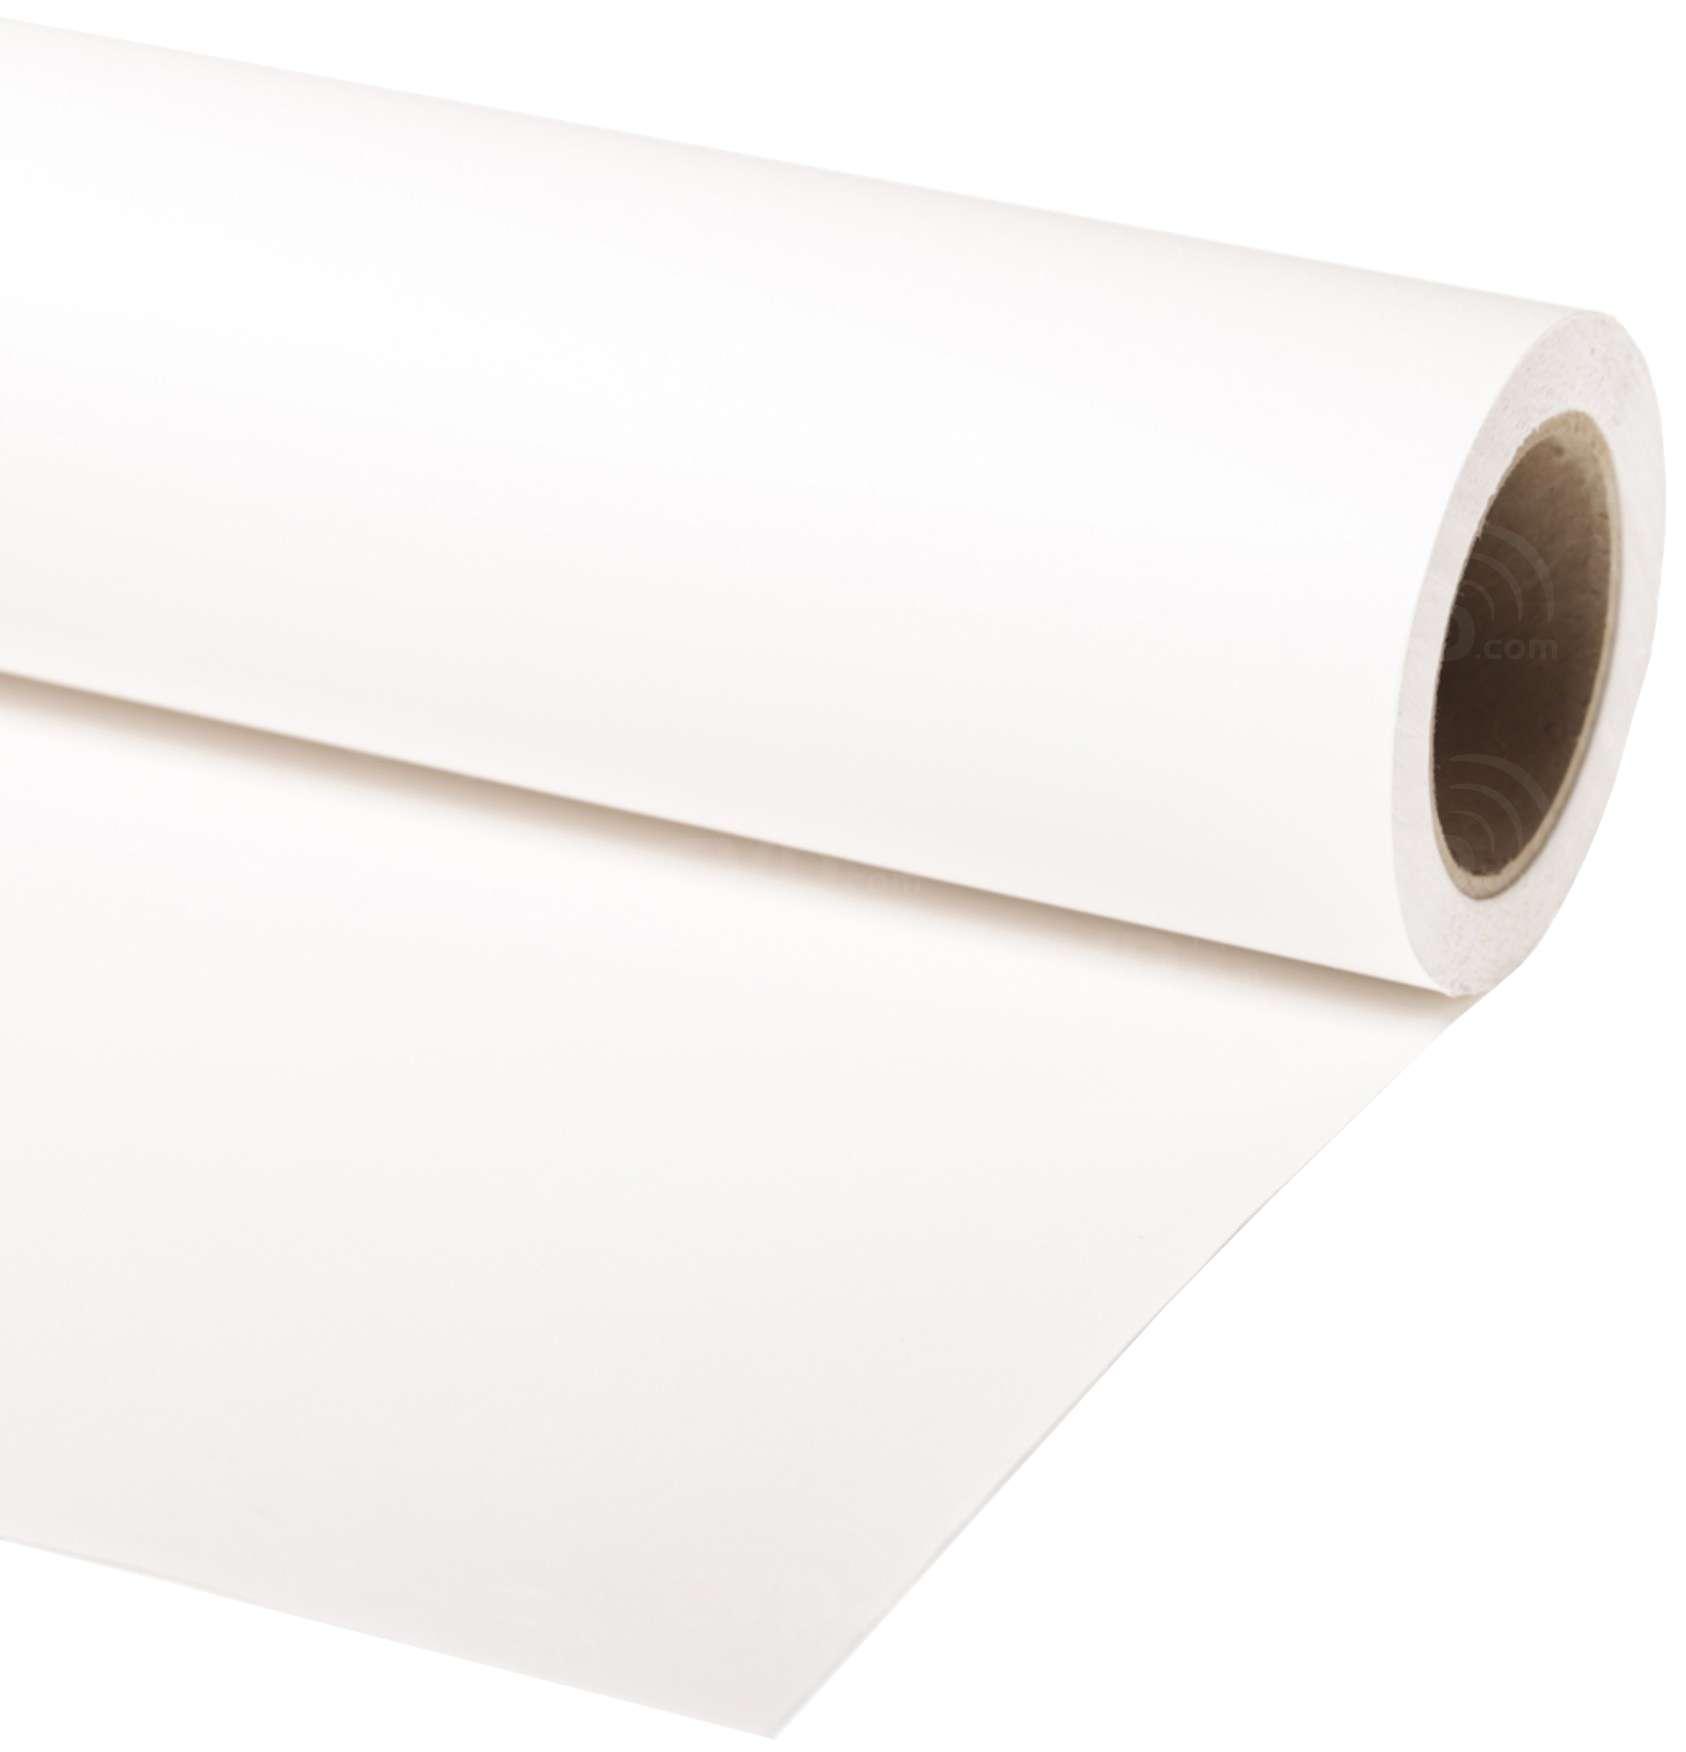 LL LP9050 White Paper 2.75x11m